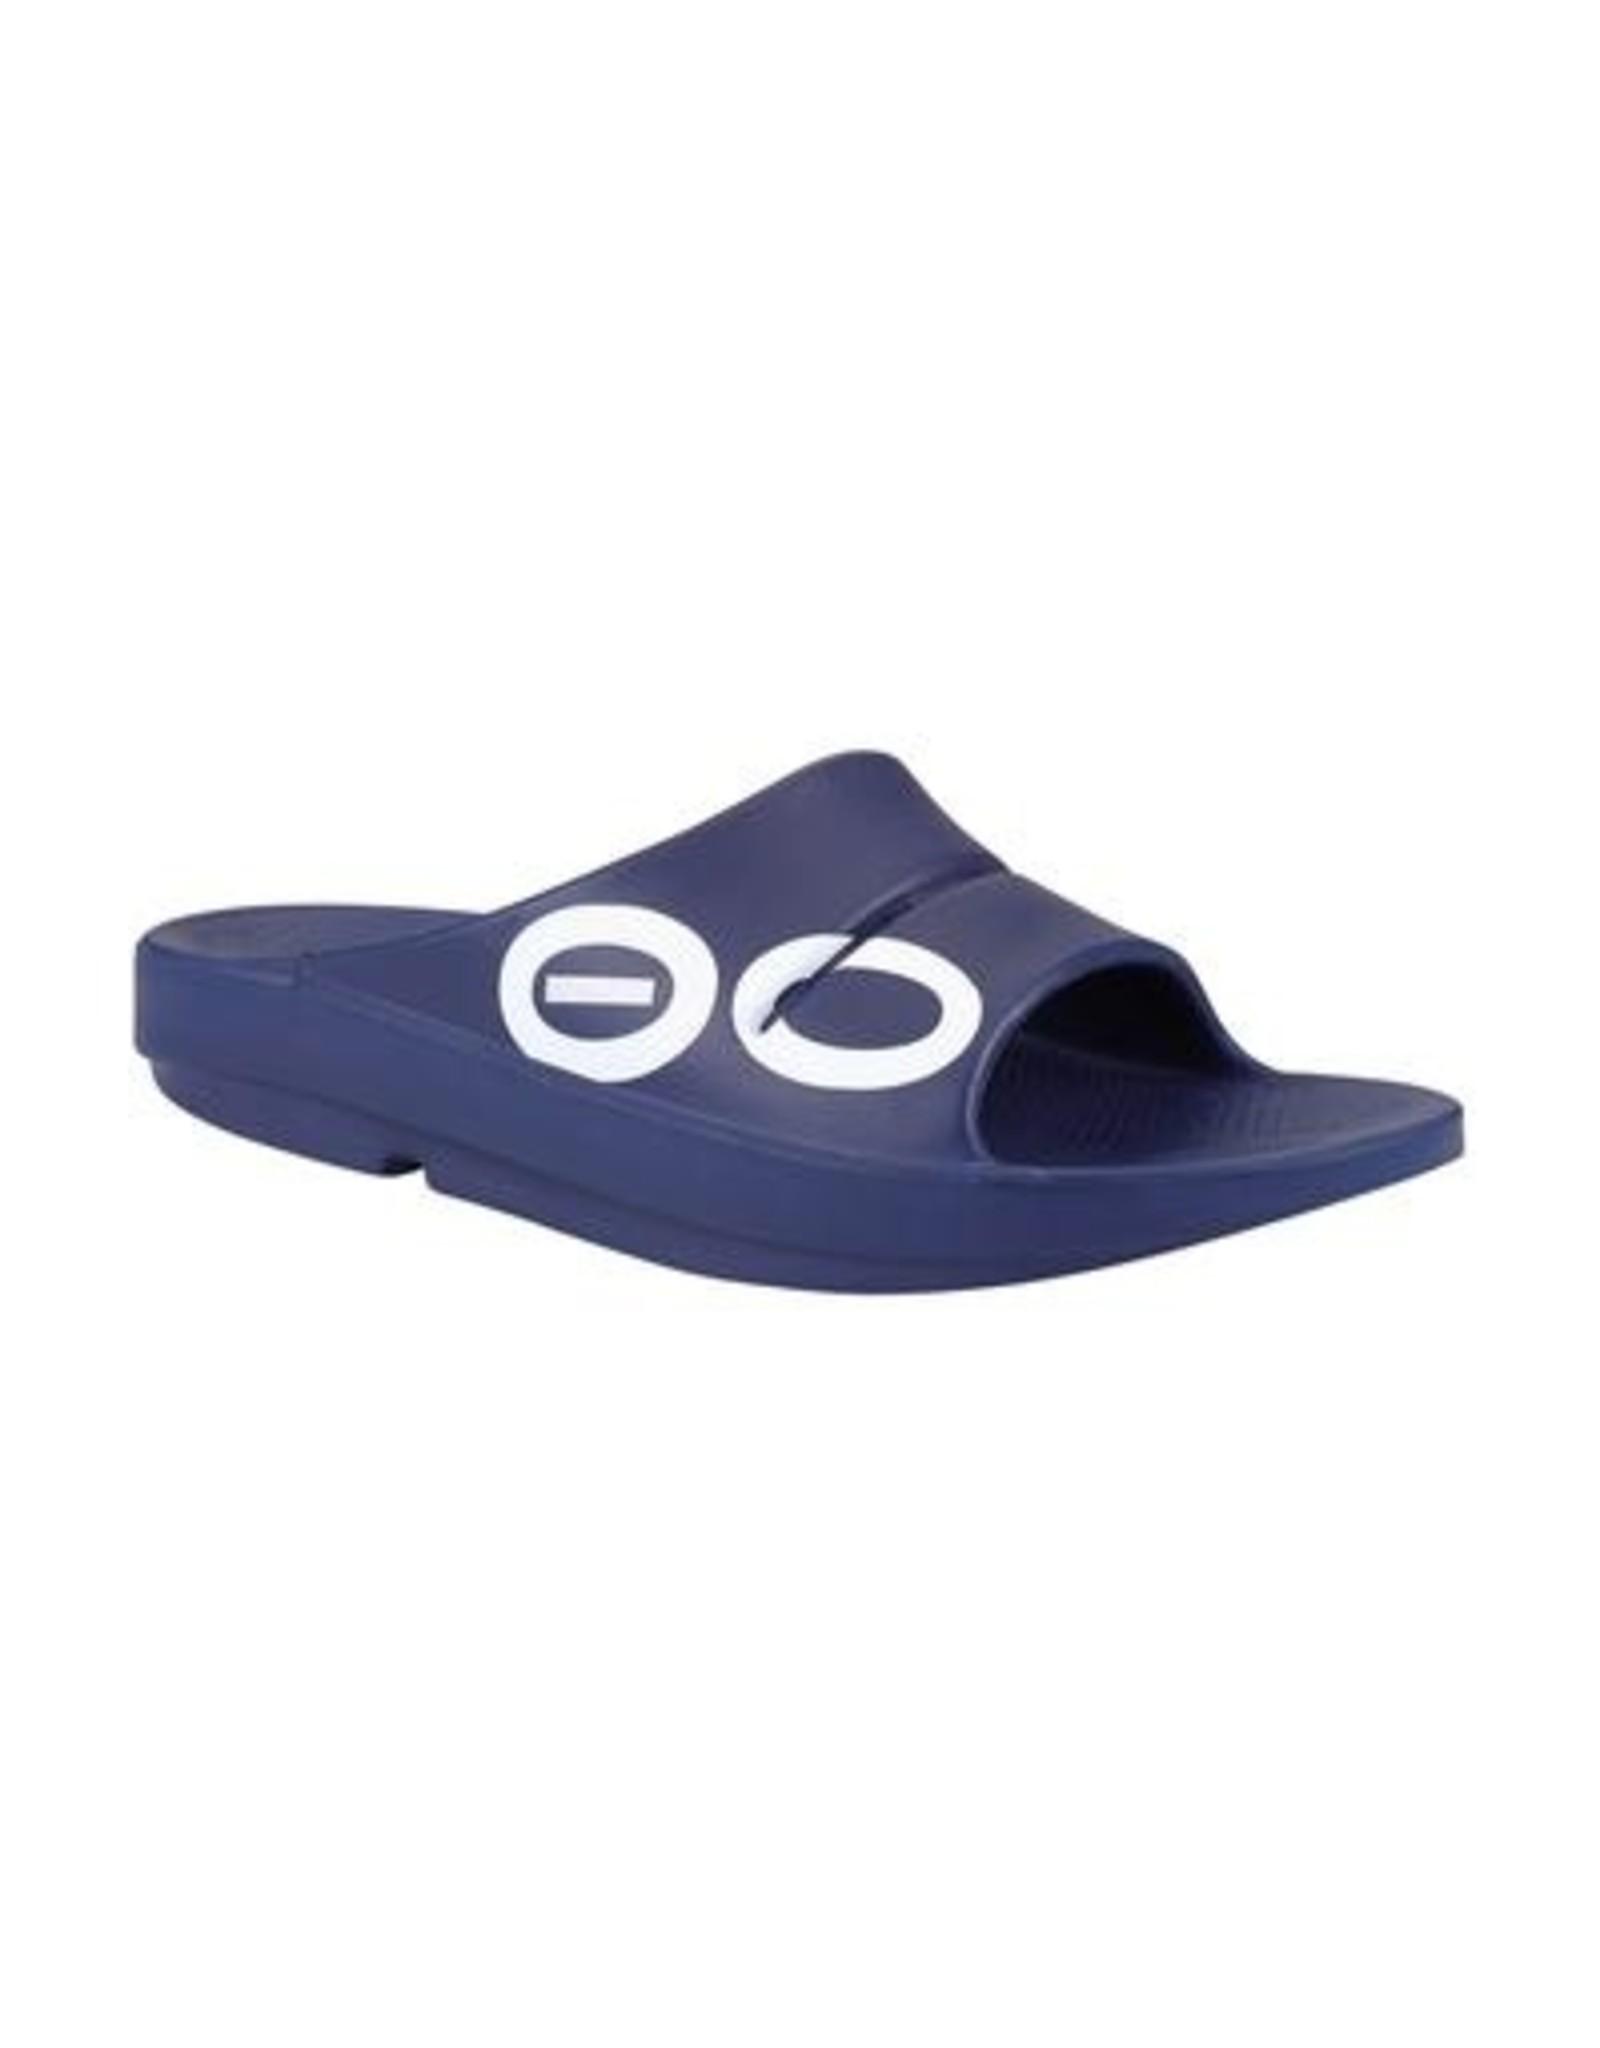 OOFOS Ooahh Sport Wave Slide